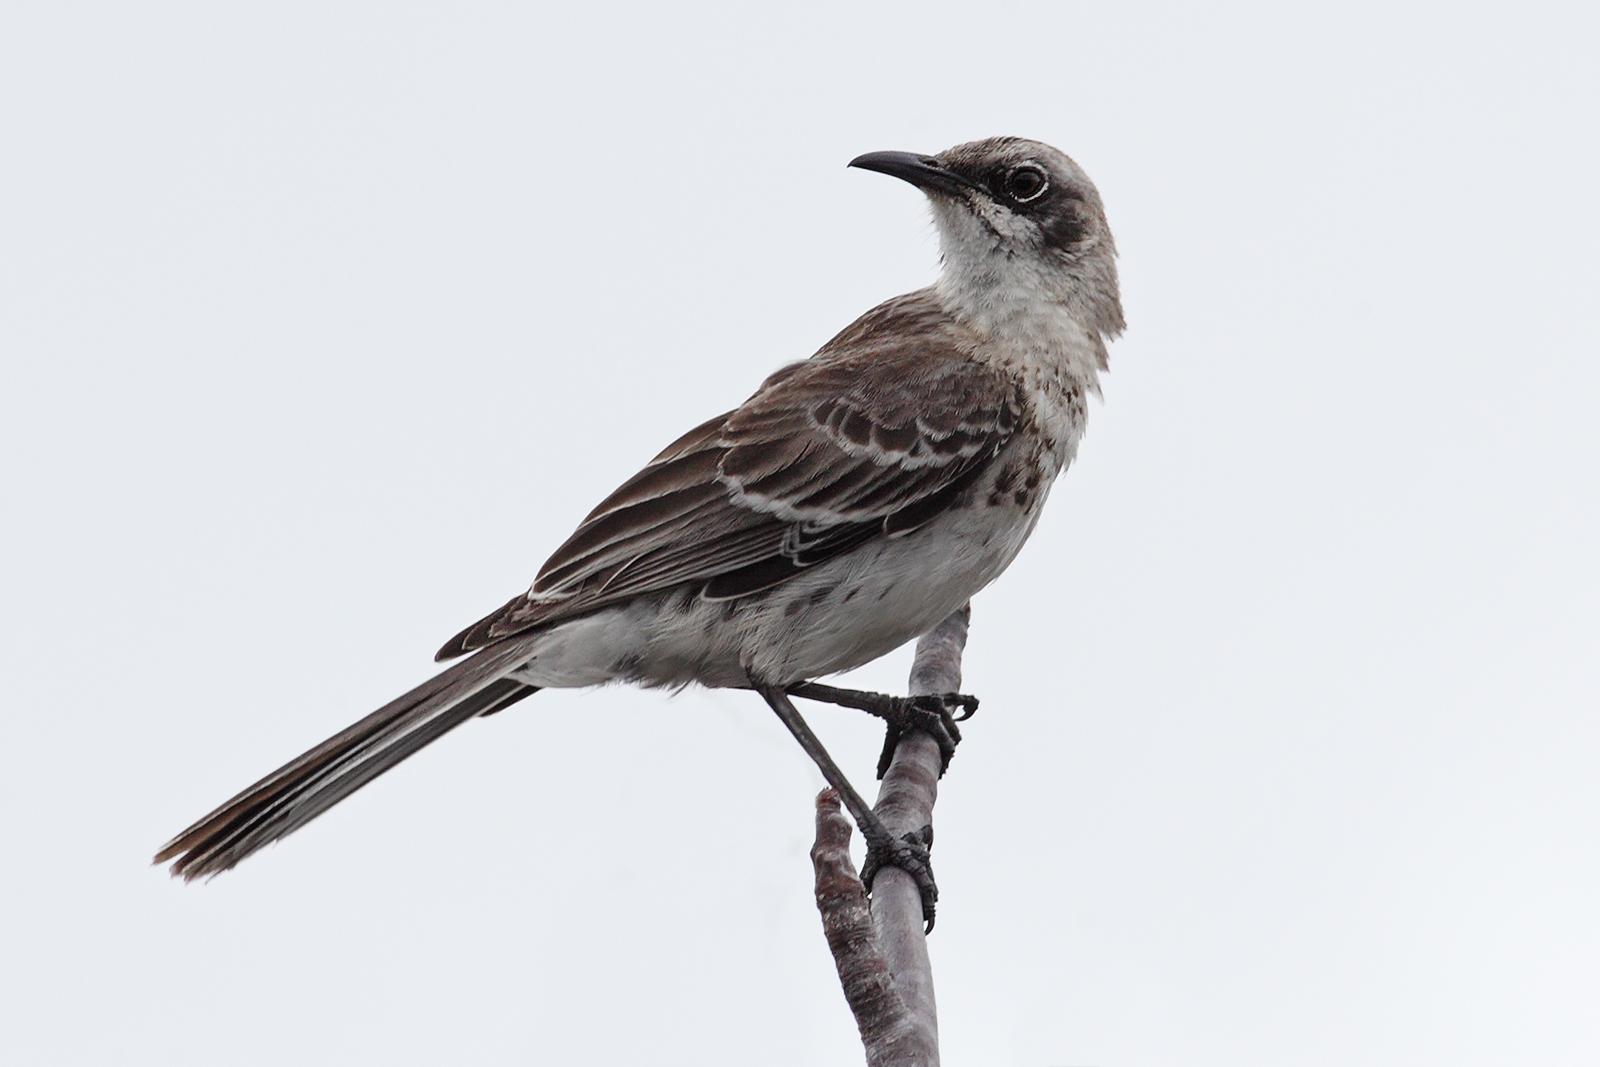 The Mockingbirds You Stole My Love